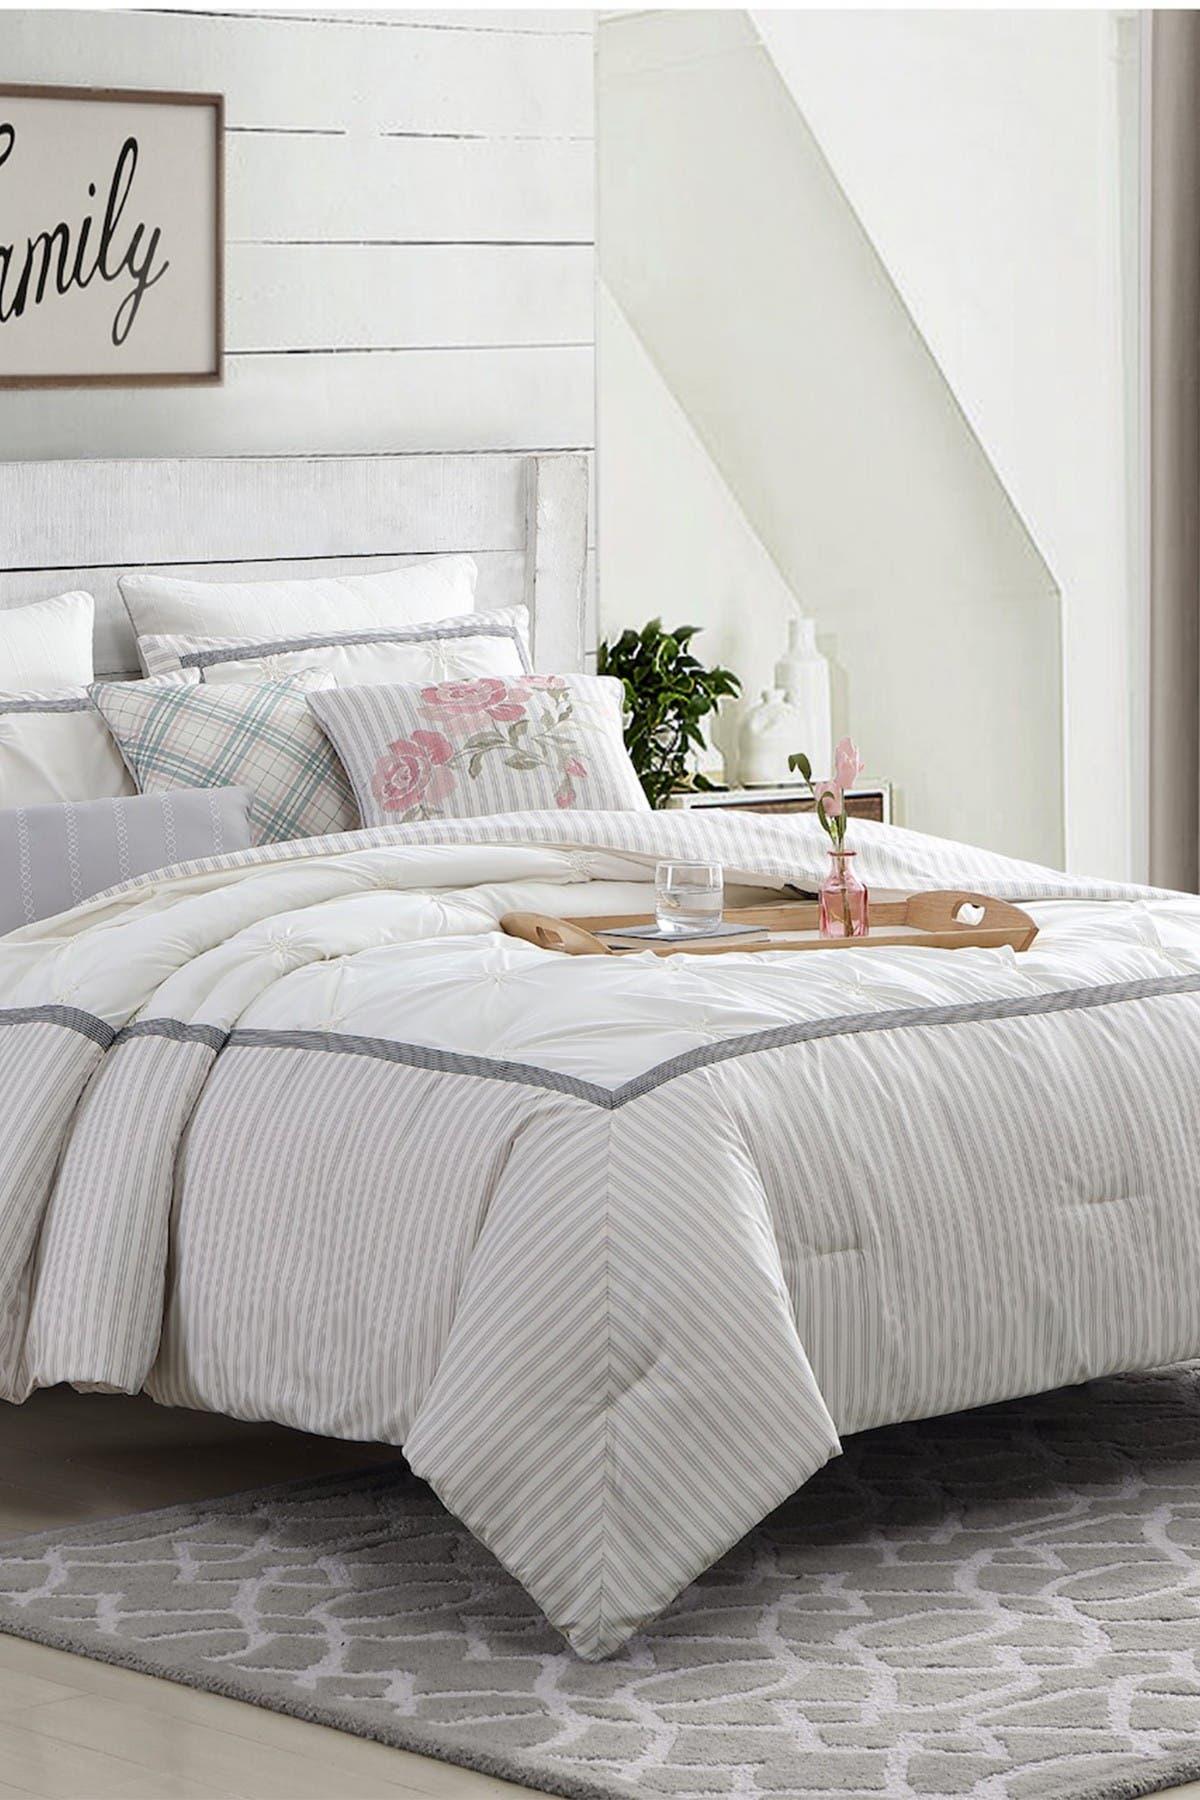 Image of Modern Threads 8-Piece Fashion Comforter Set - Remi - Queen